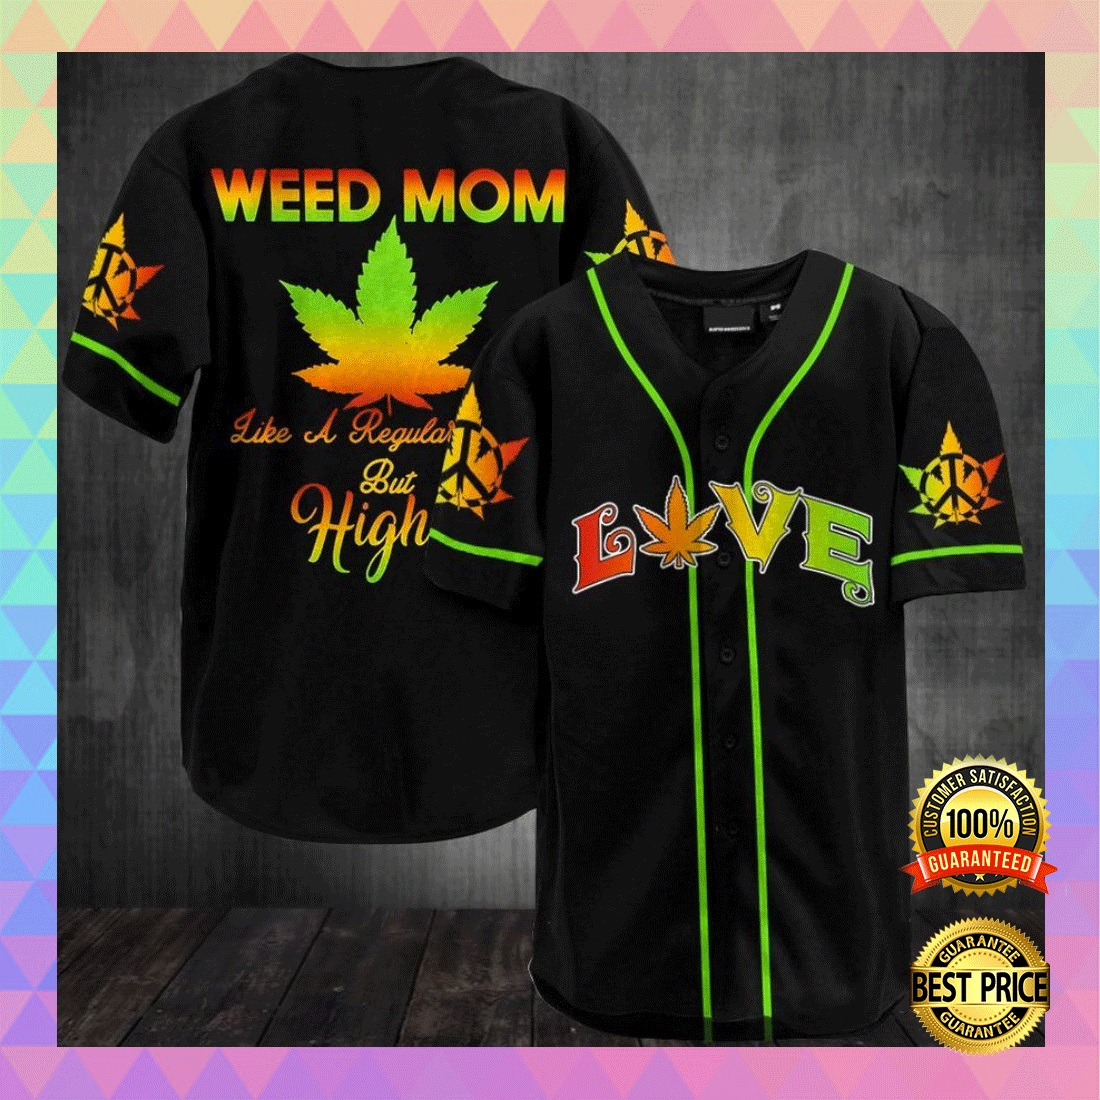 WEED MOM LIKE A REGULAR MOM BUT HIGHER BASEBALL JERSEY 5